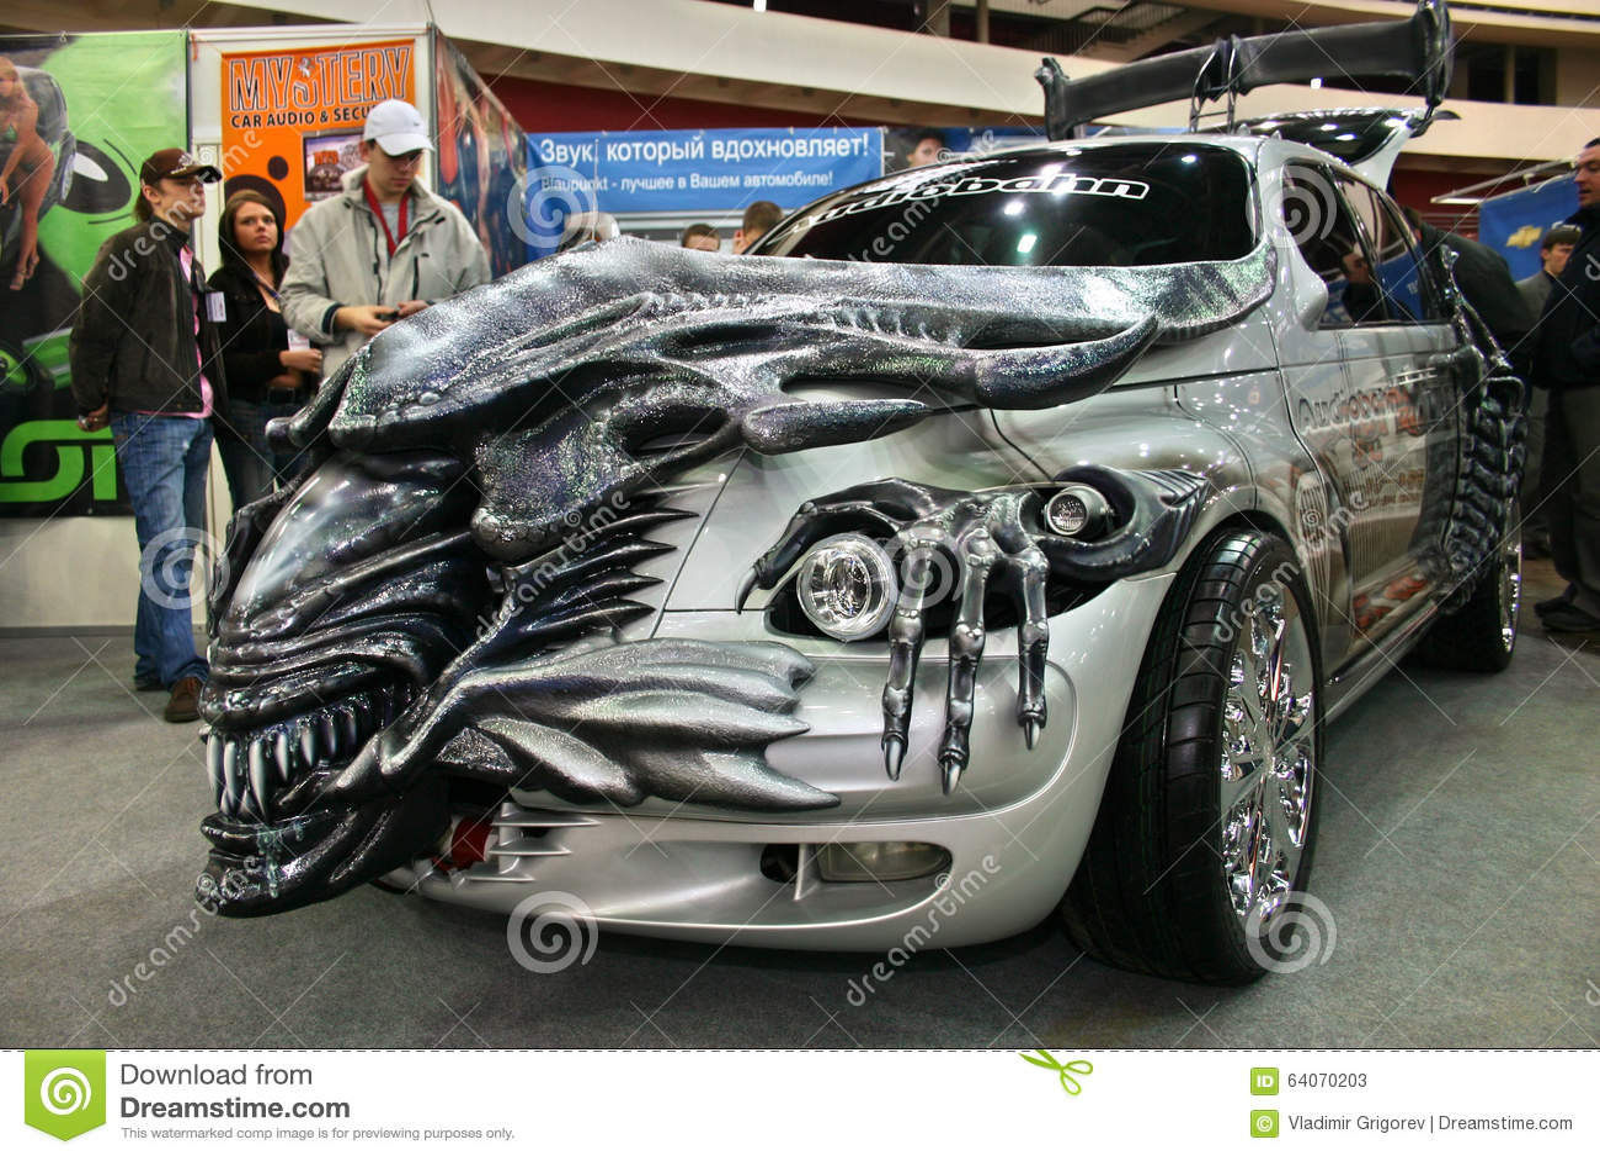 Auto Vinyl Wrap >> Car Tuning Style Alien, This Alien-themed PT Cruiser Was ...